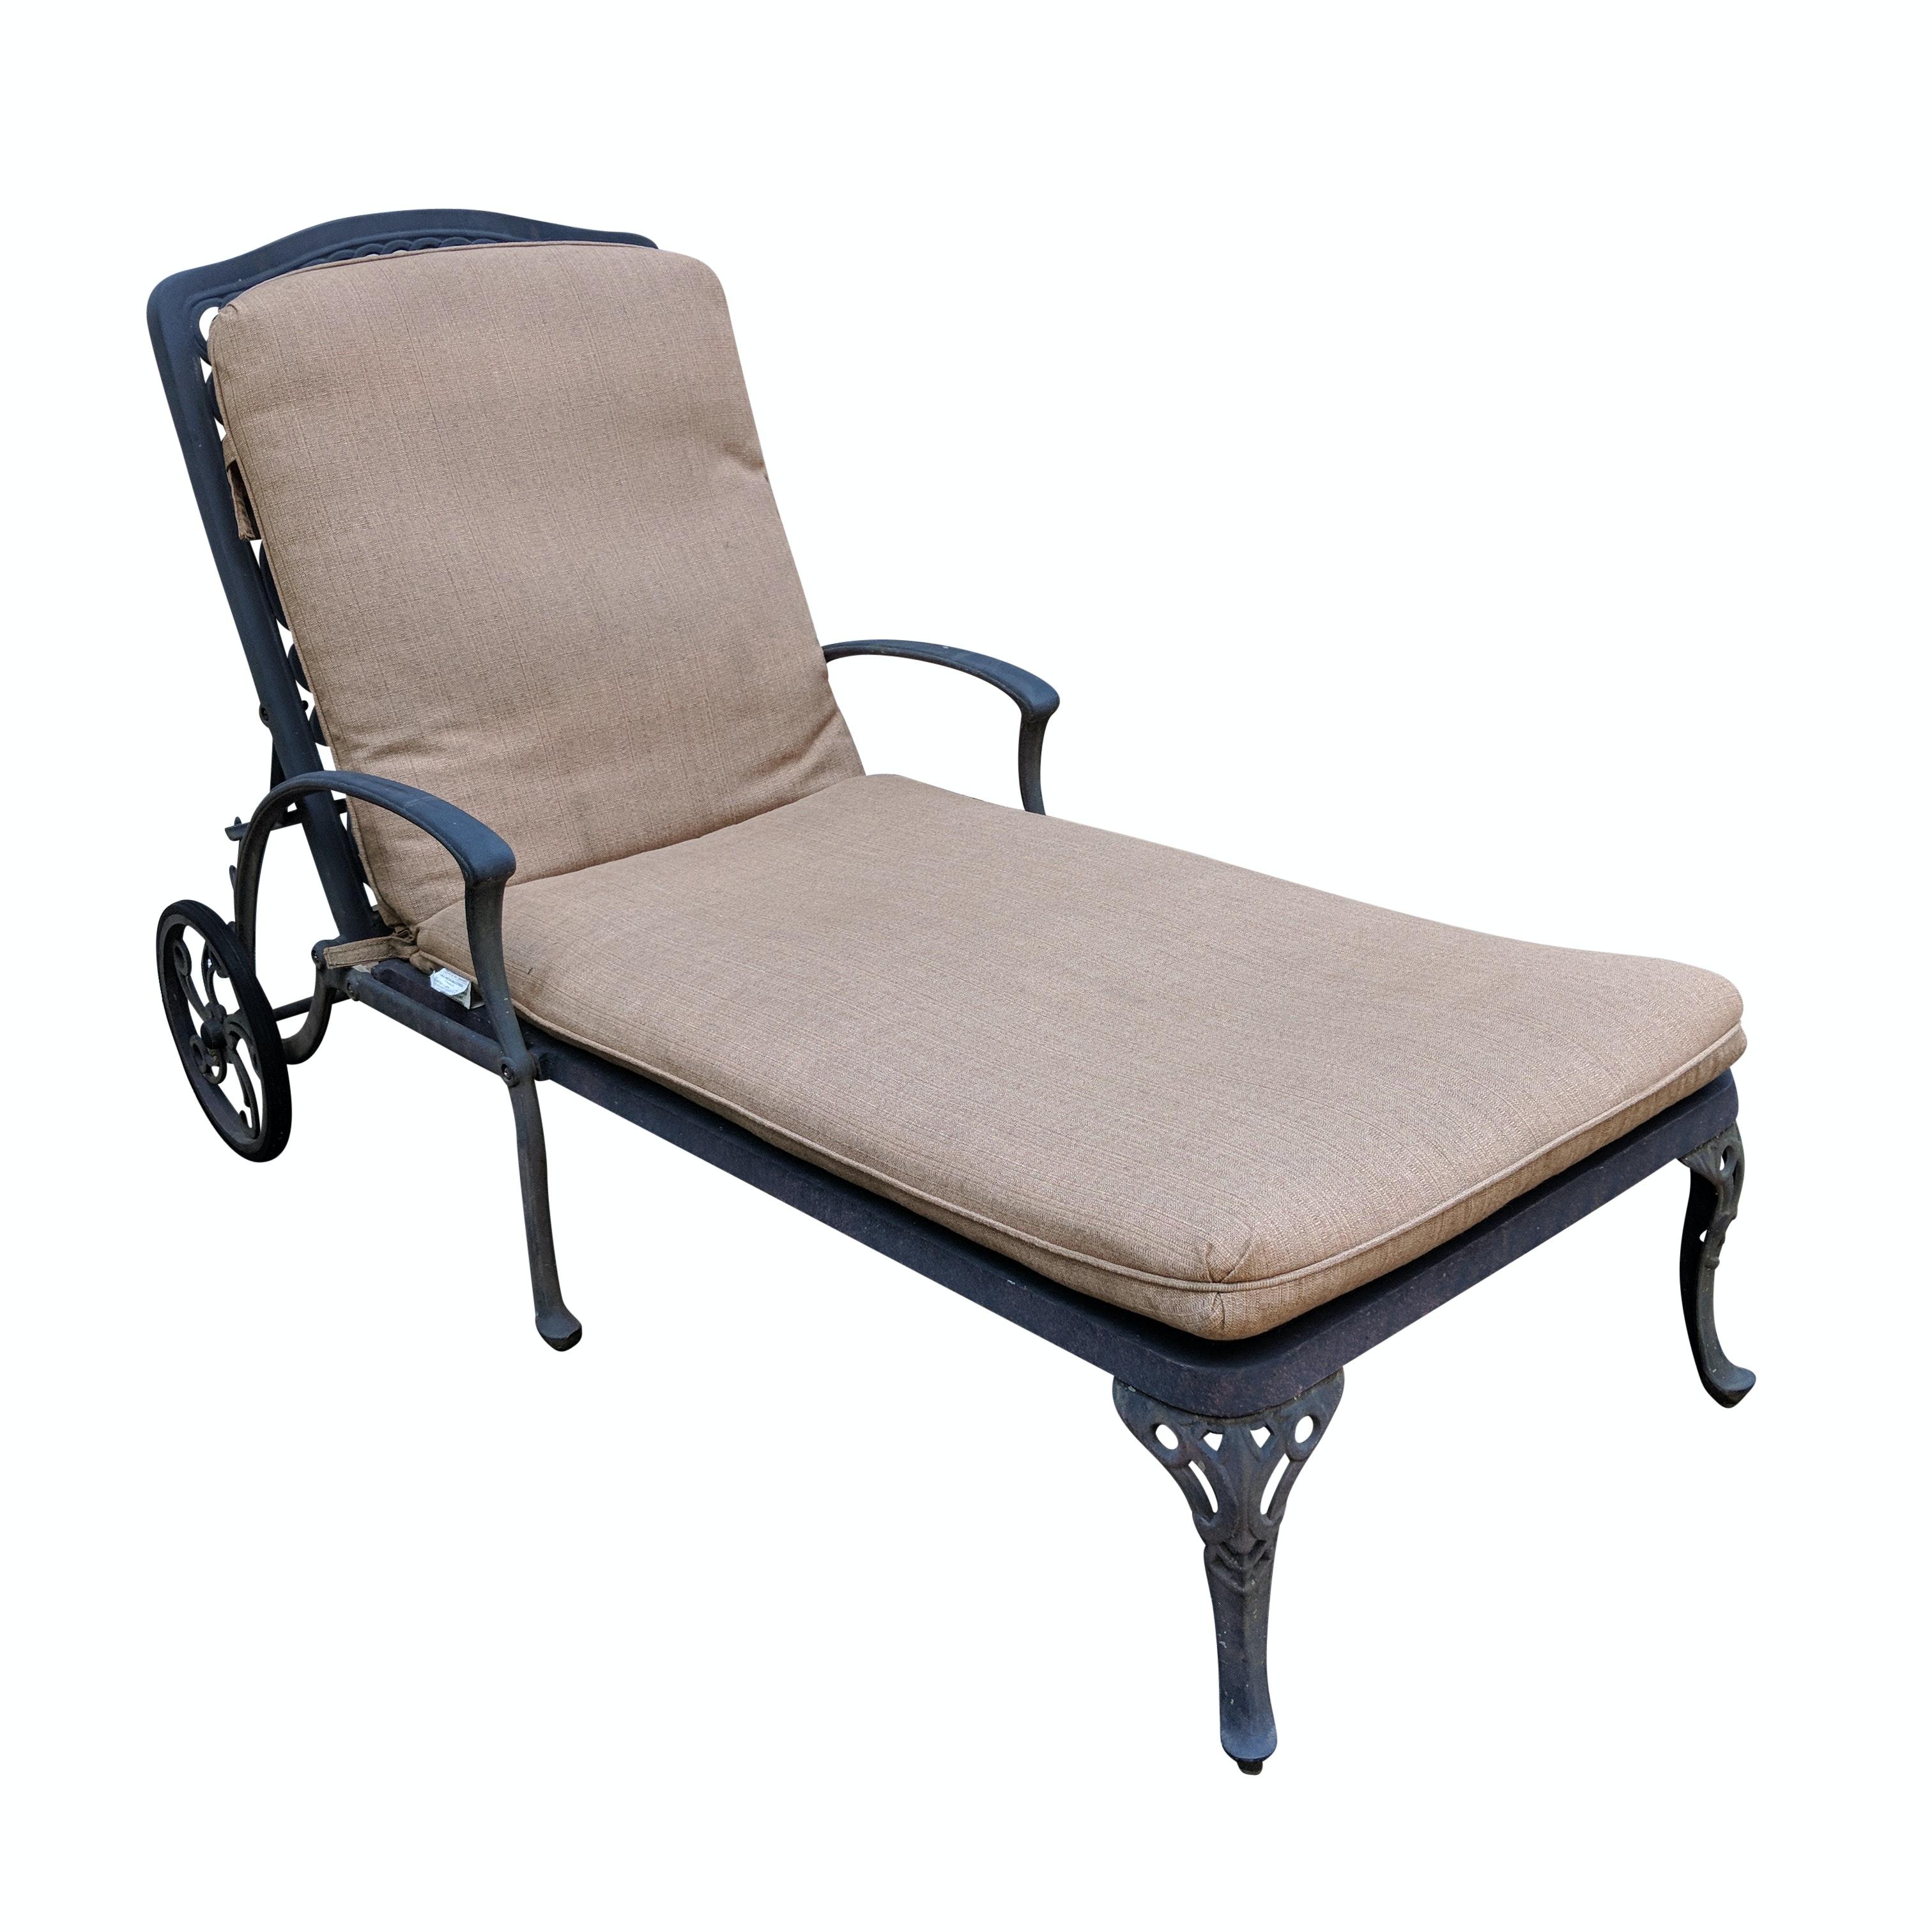 "Hanamint ""Tuscany"" Cast Aluminum Chaise Lounge"